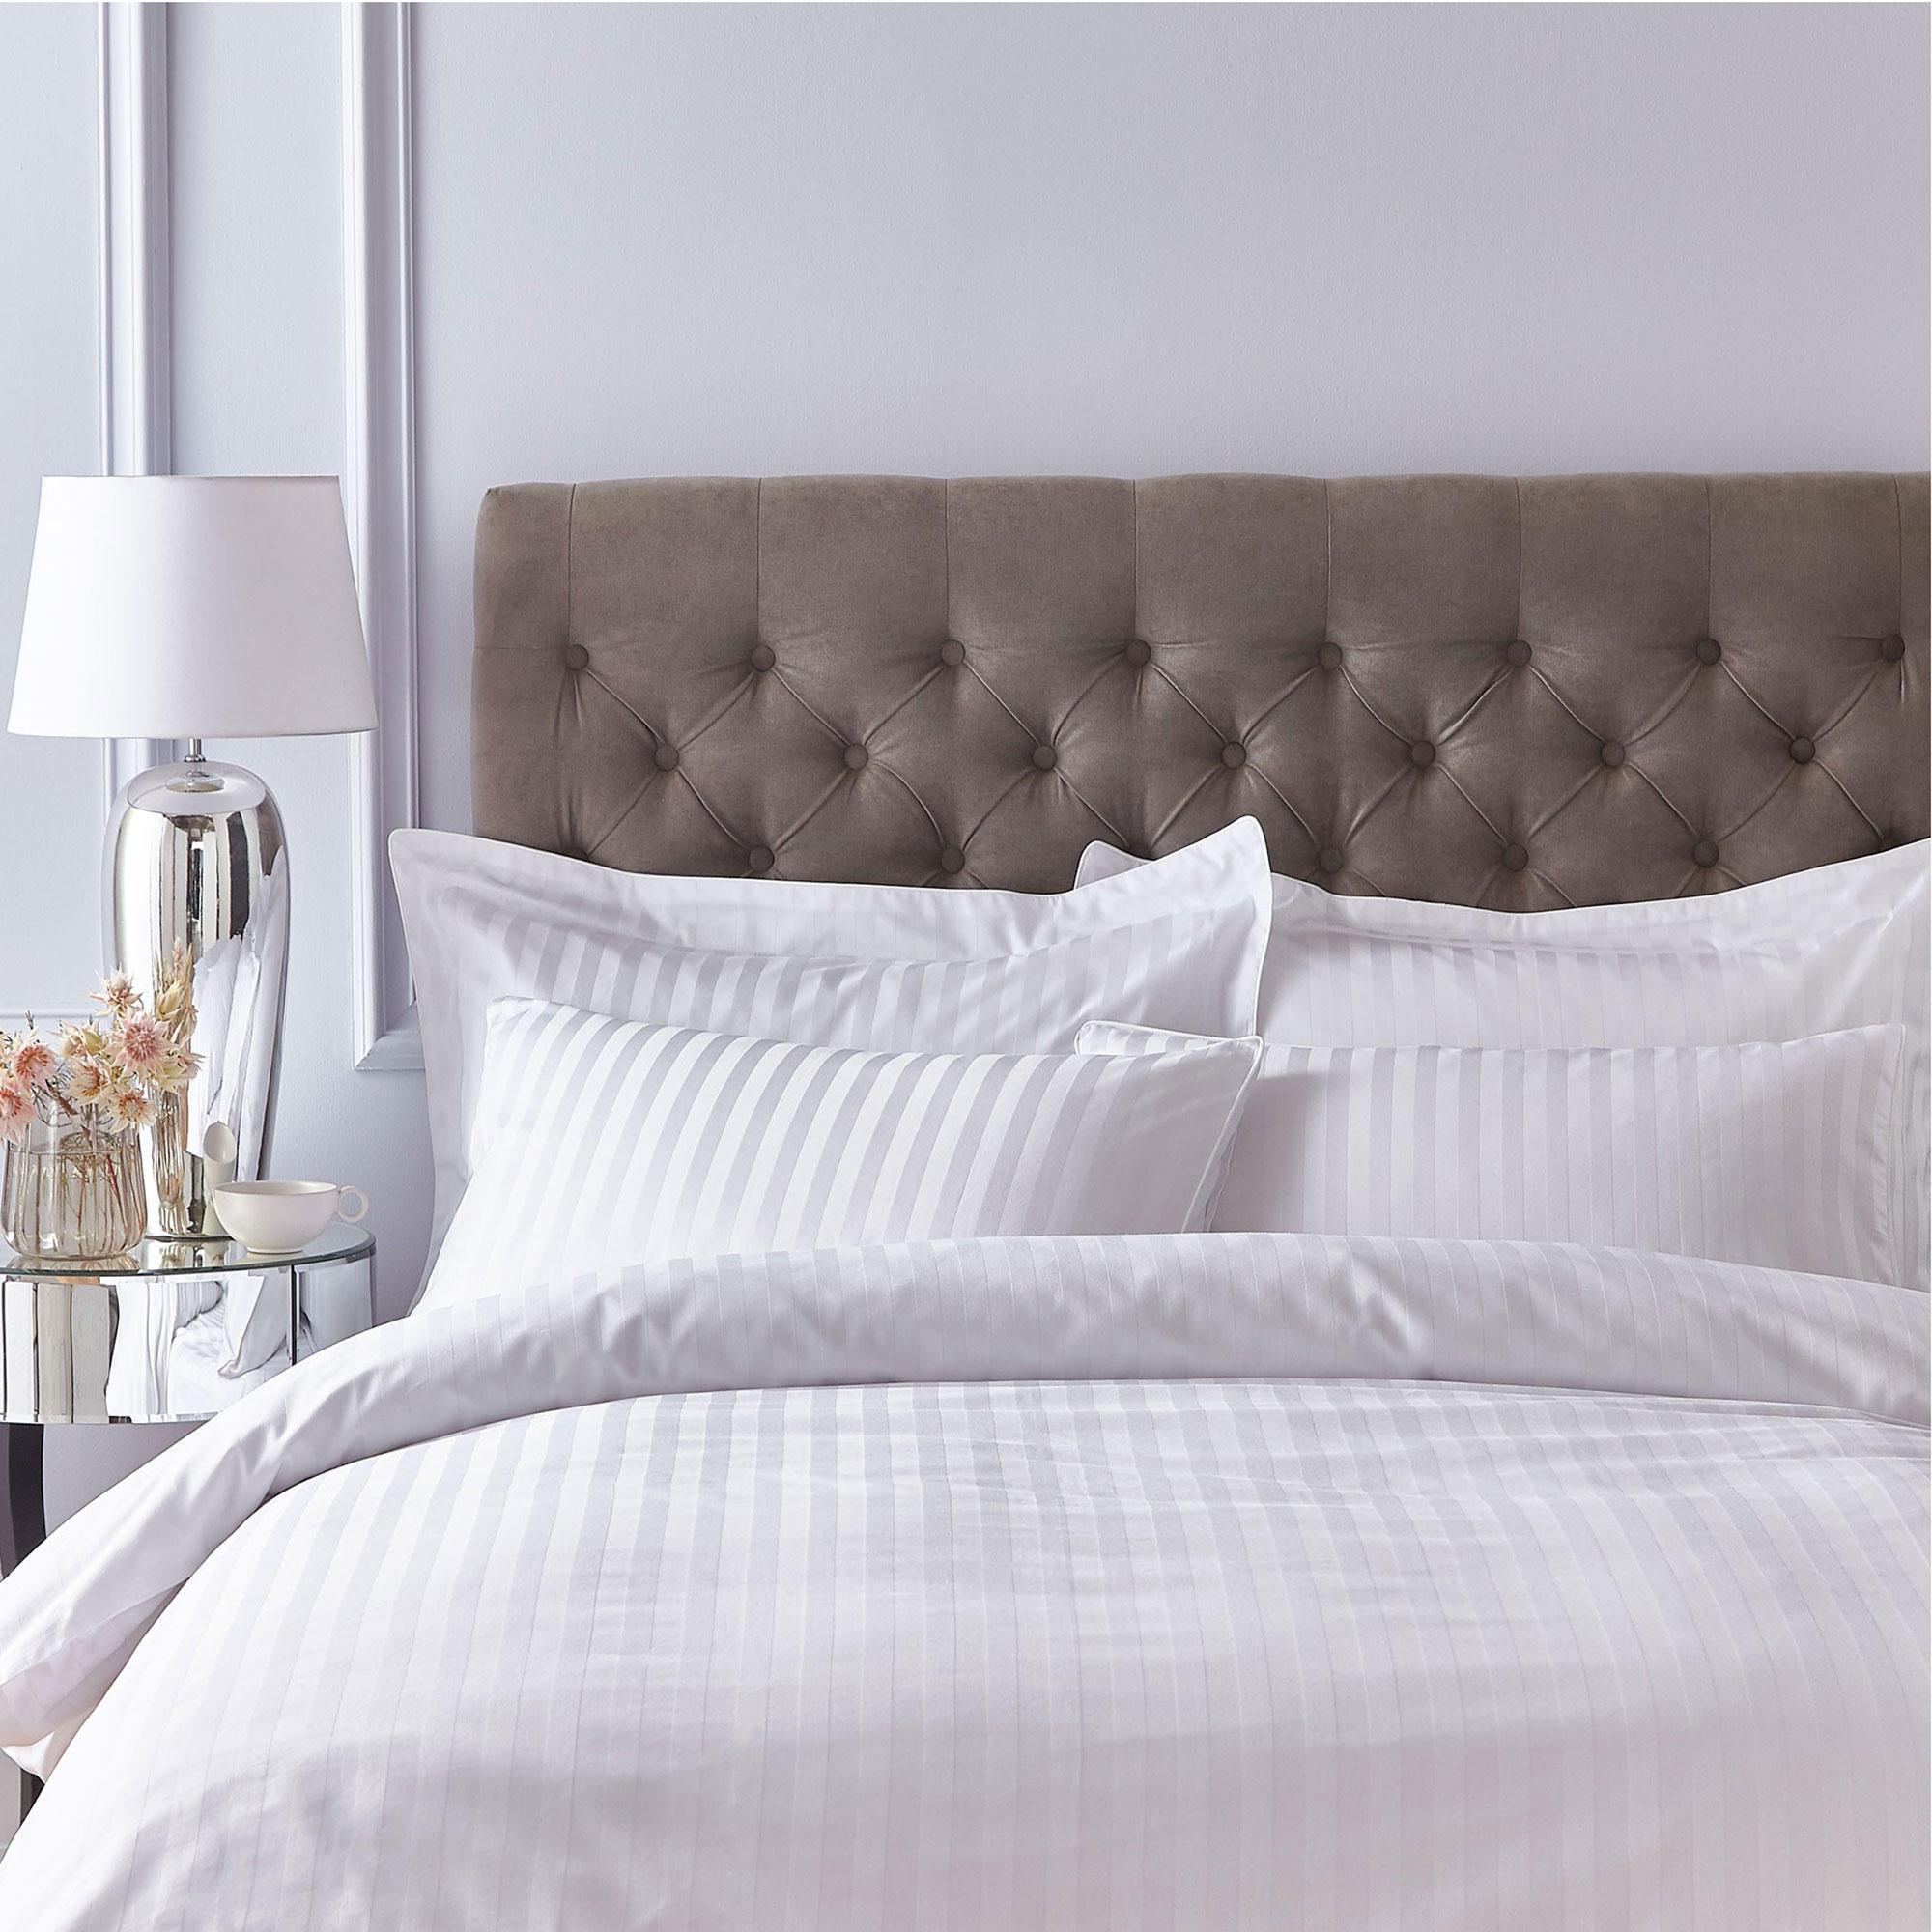 138496361: Satin 200 Thread Count Housewife Pillowcase Pair White